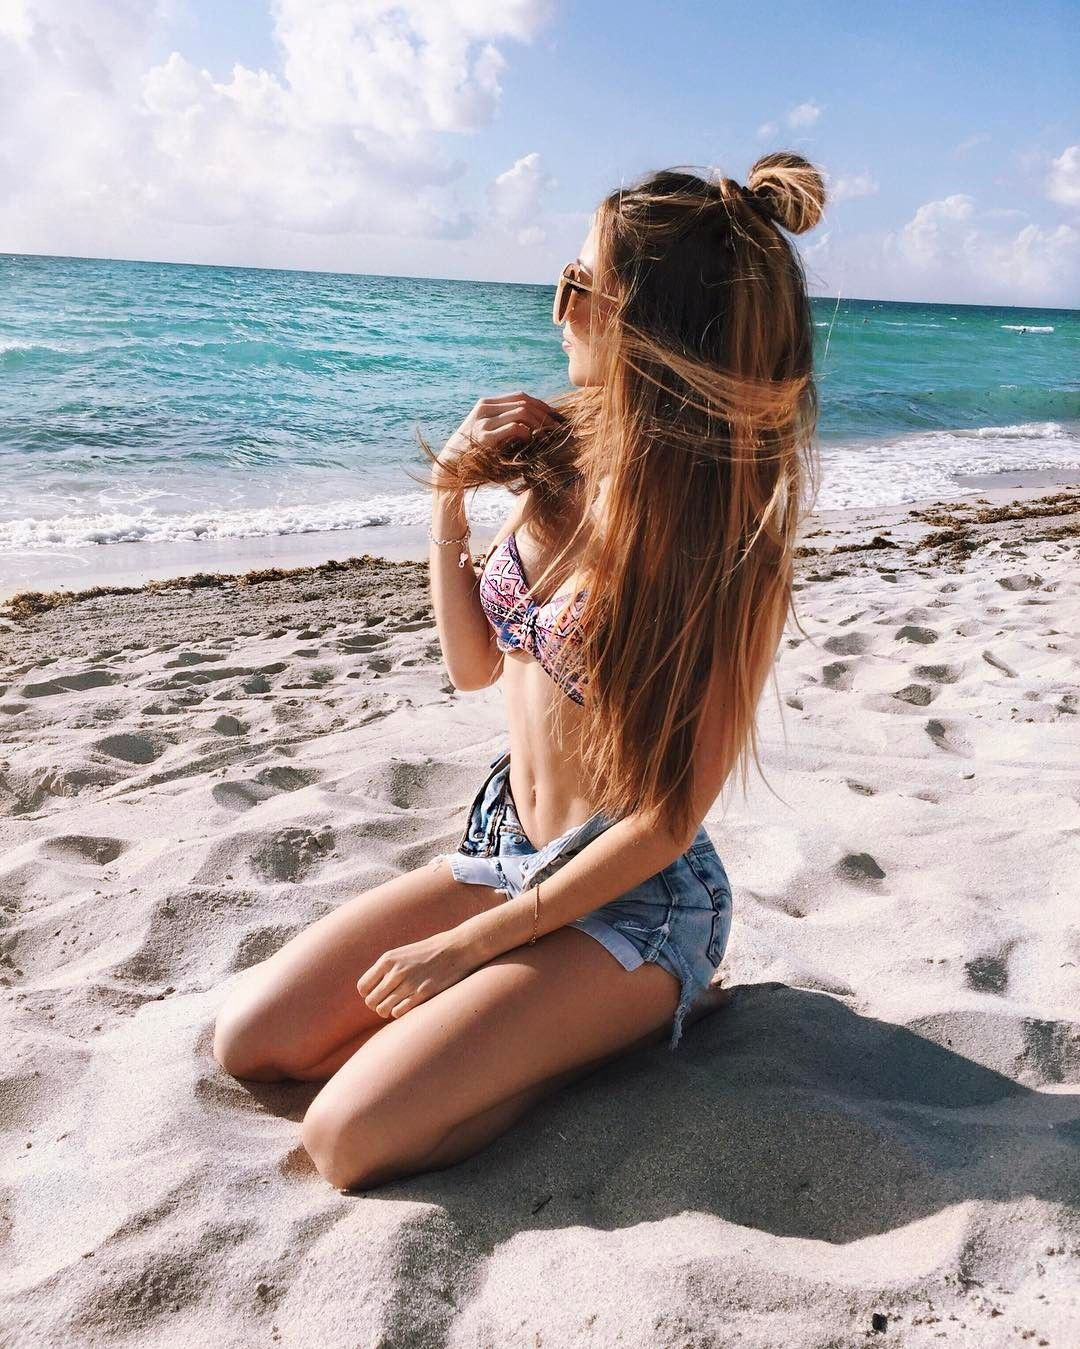 Девушки лето пляж картинки